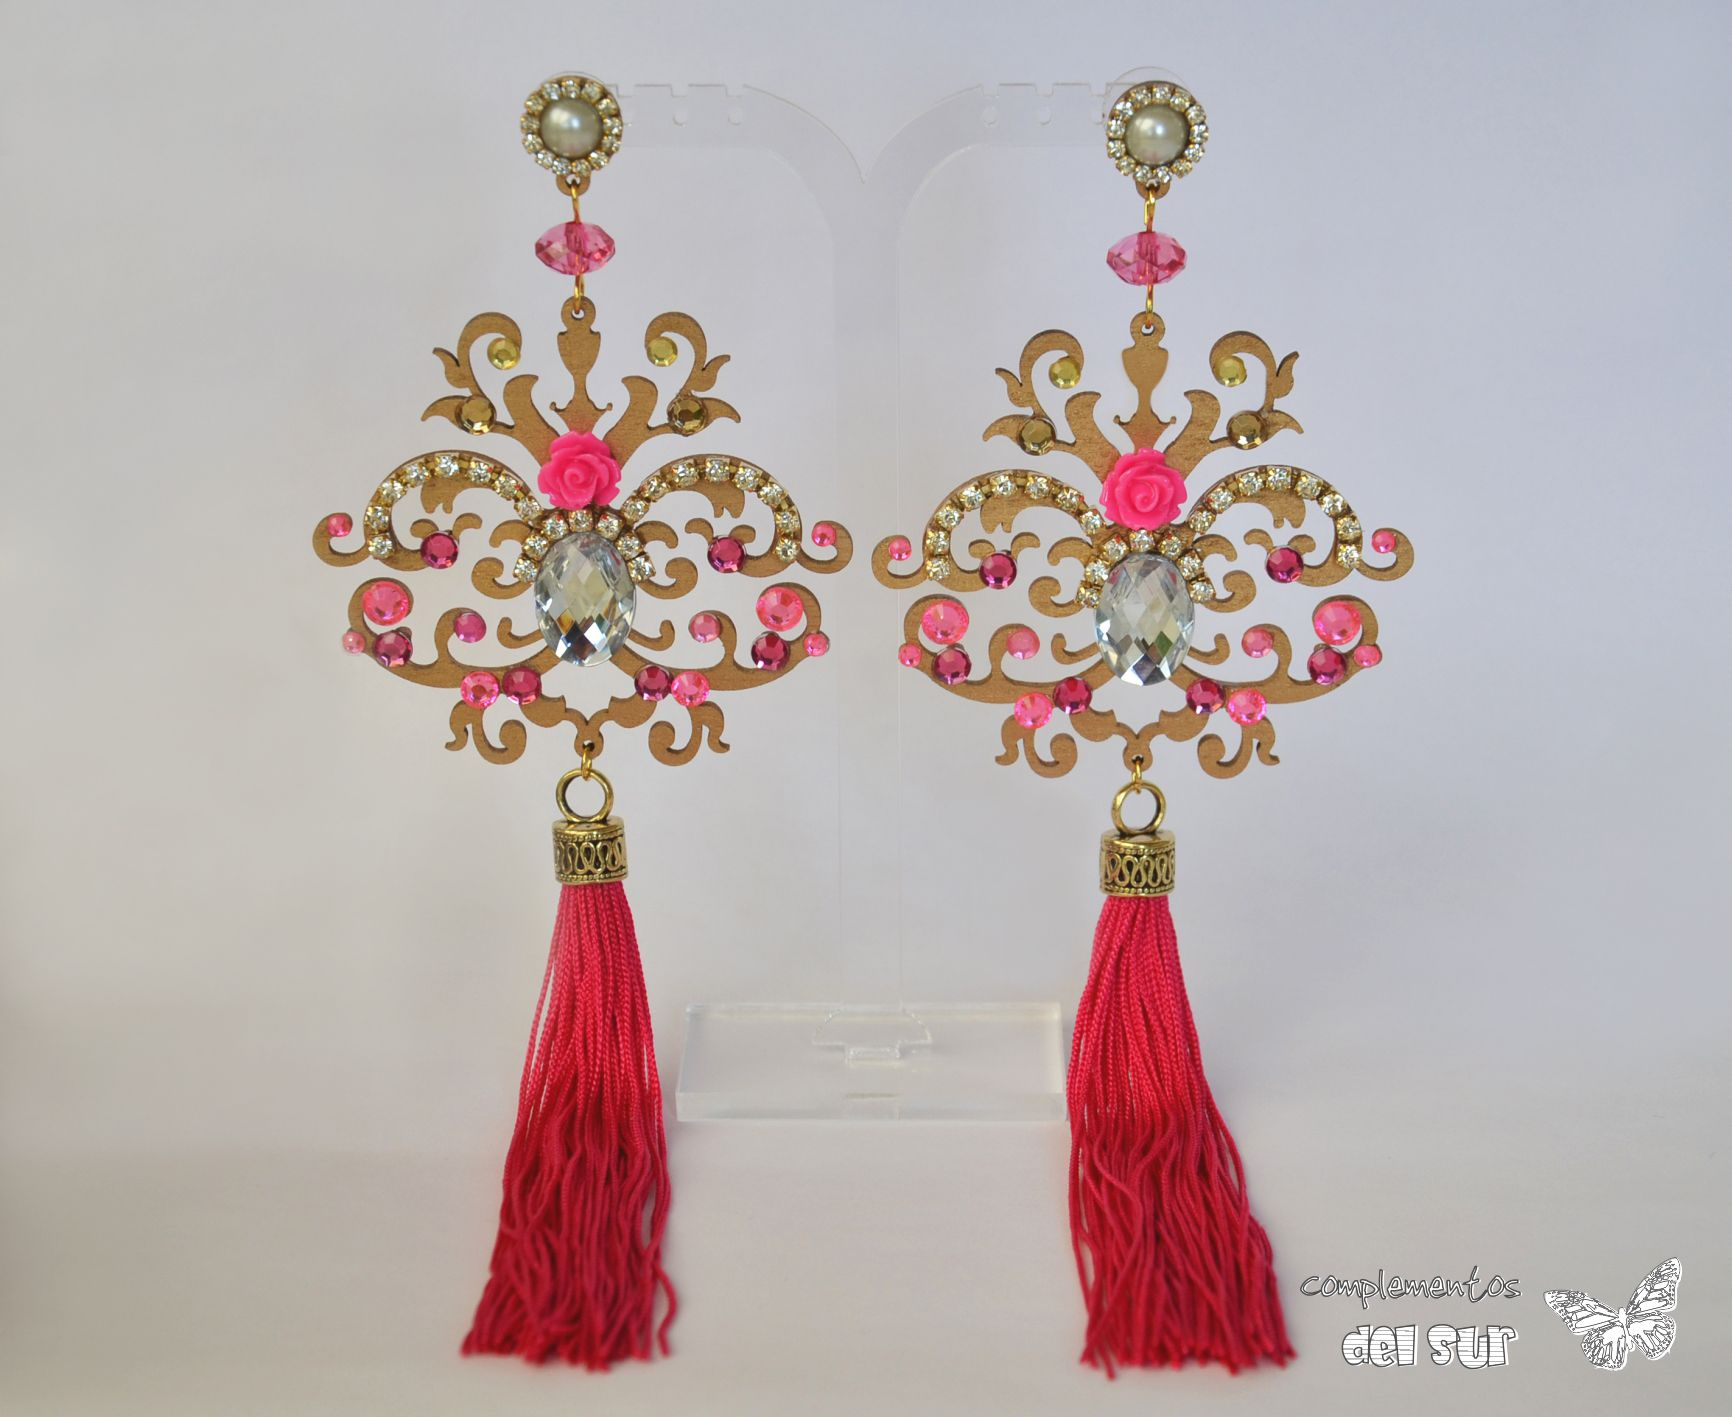 77046f0cf764 Conjunto Bisuteria abanico Flamenca Set de complementos Sevillana Flor